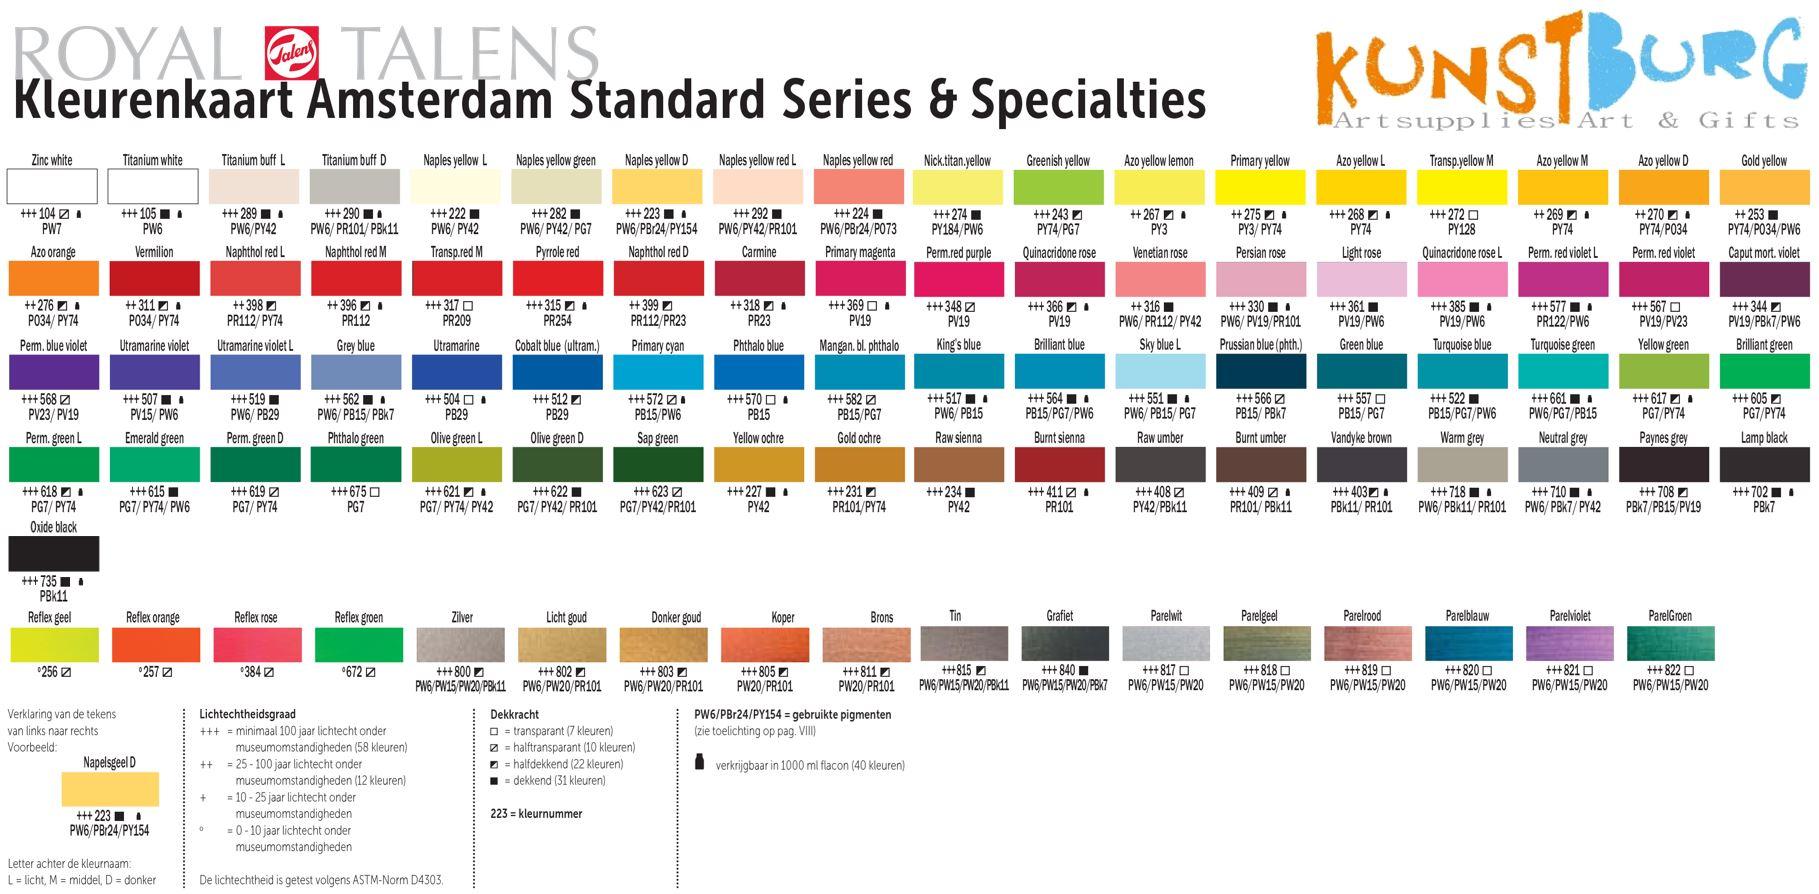 Kleurenkaart Amsterdam Standard Series